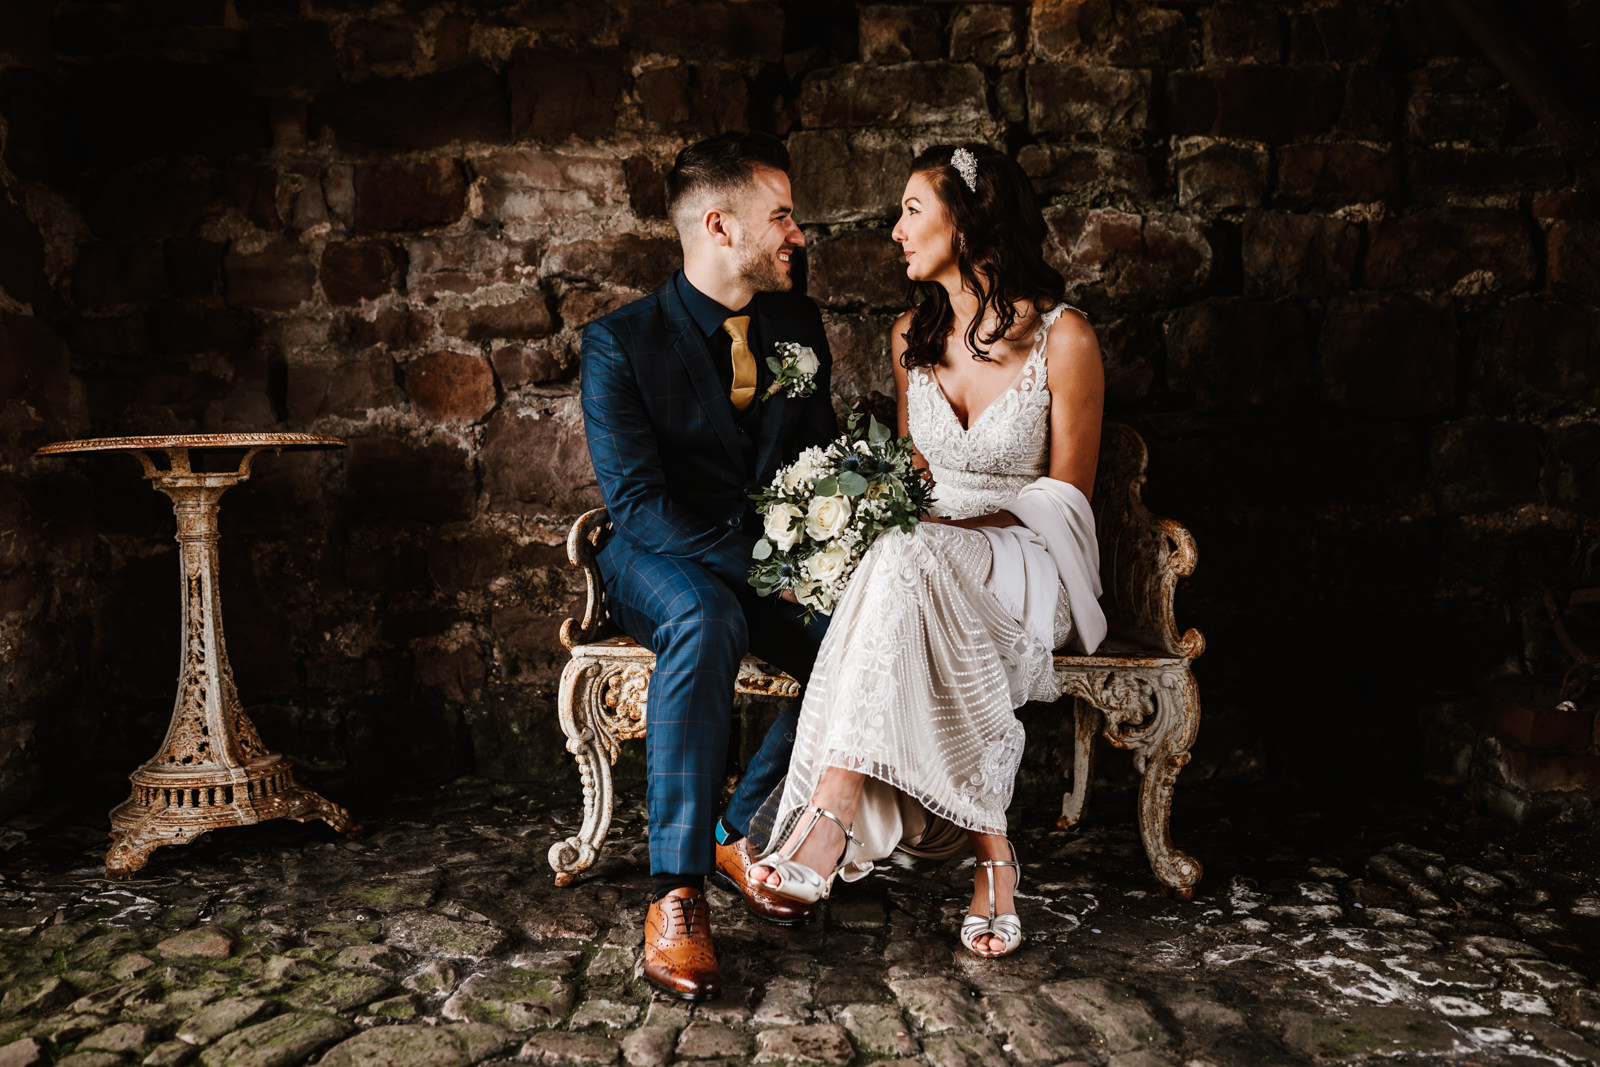 The Ashes Wedding Barns Photographer